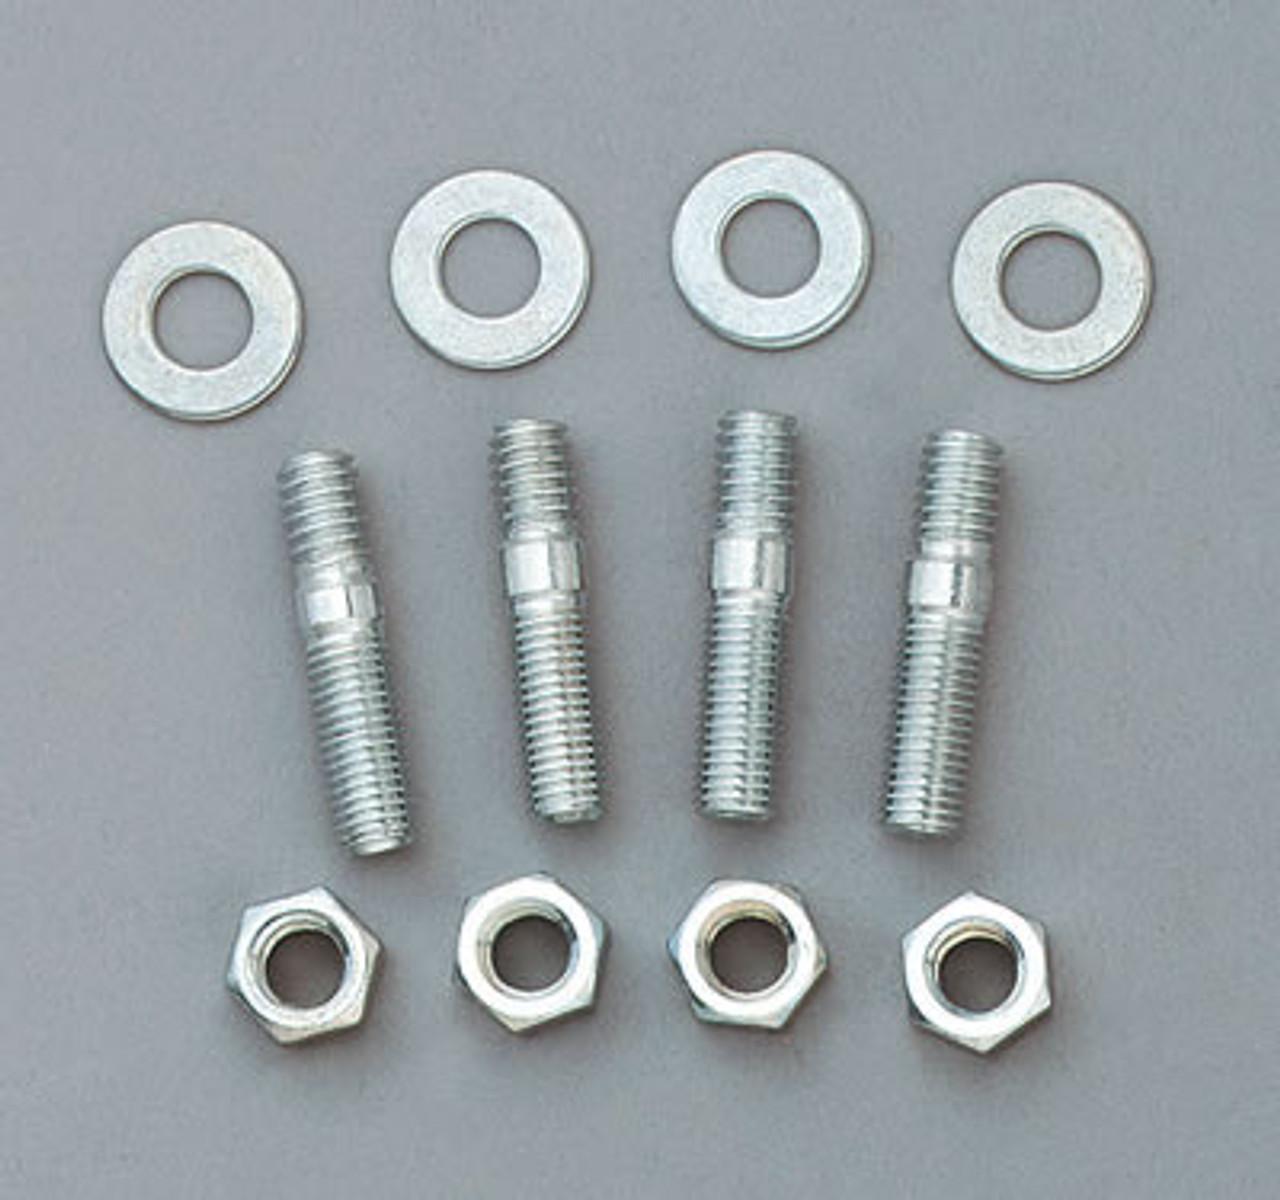 "5//16/"" Carburetor Intake Studs Nuts /& Washers 1-3//8/"" Long Holley Edelbrock Carb"